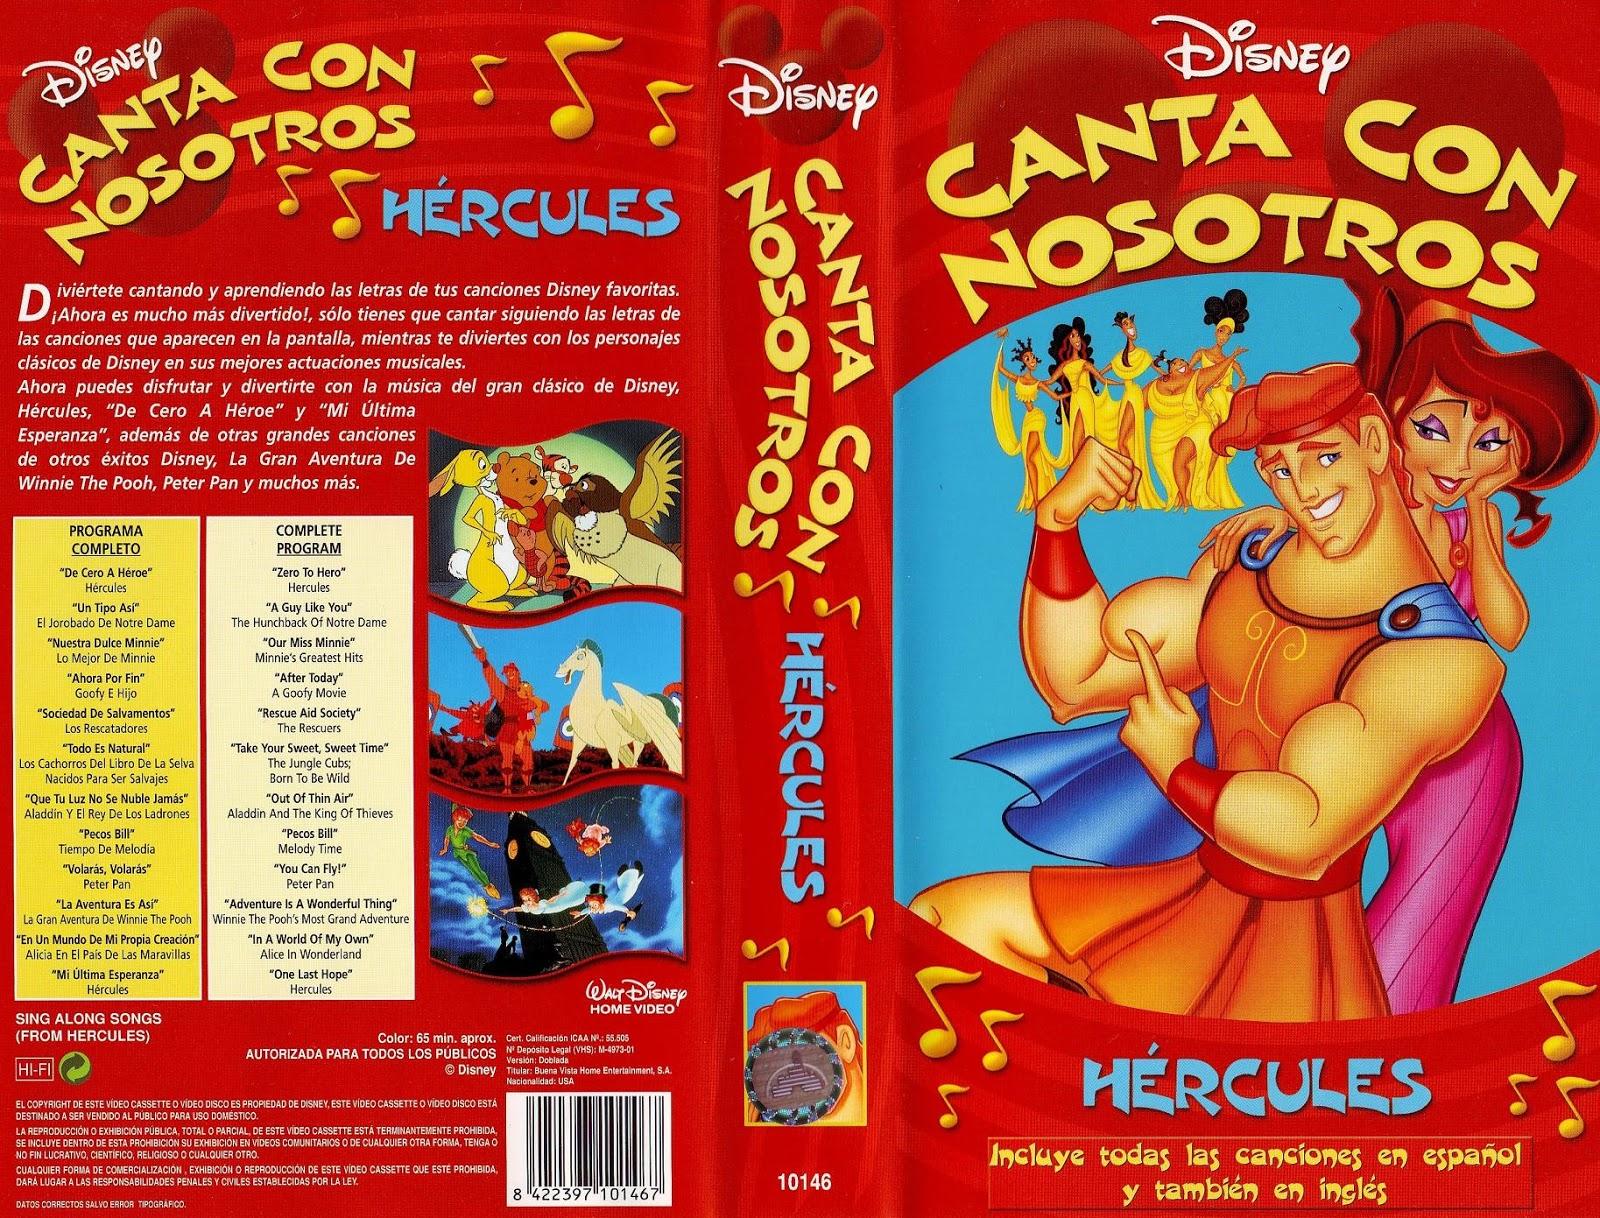 Disney's Sing-Along Songs from Hercules